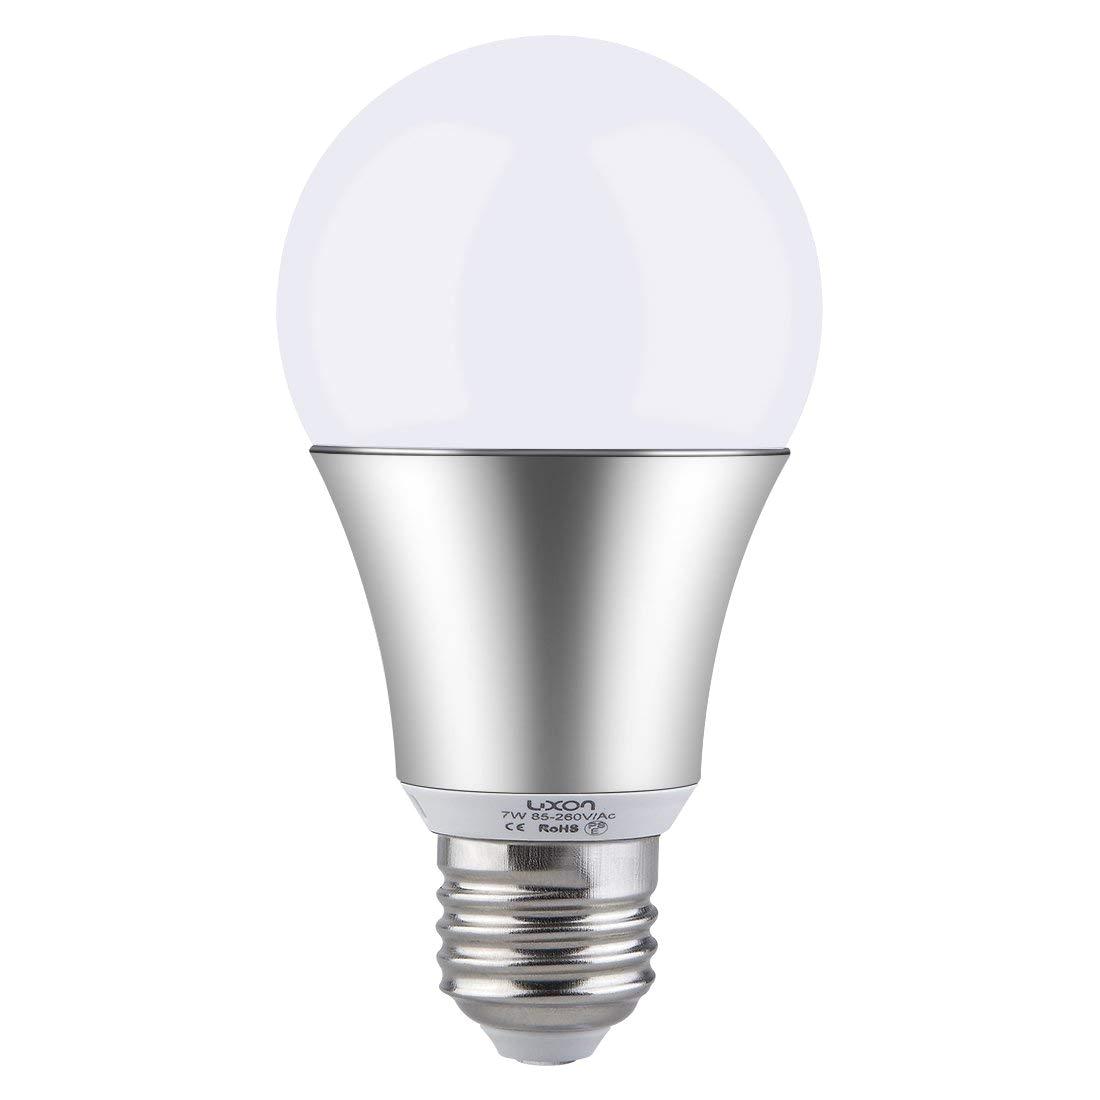 luxon motion sensor light bulb 7w smart bulb radar dusk to dawn led motion sensor light bulbs e26 base indoor sensor night lights soft white 2700k outdoor